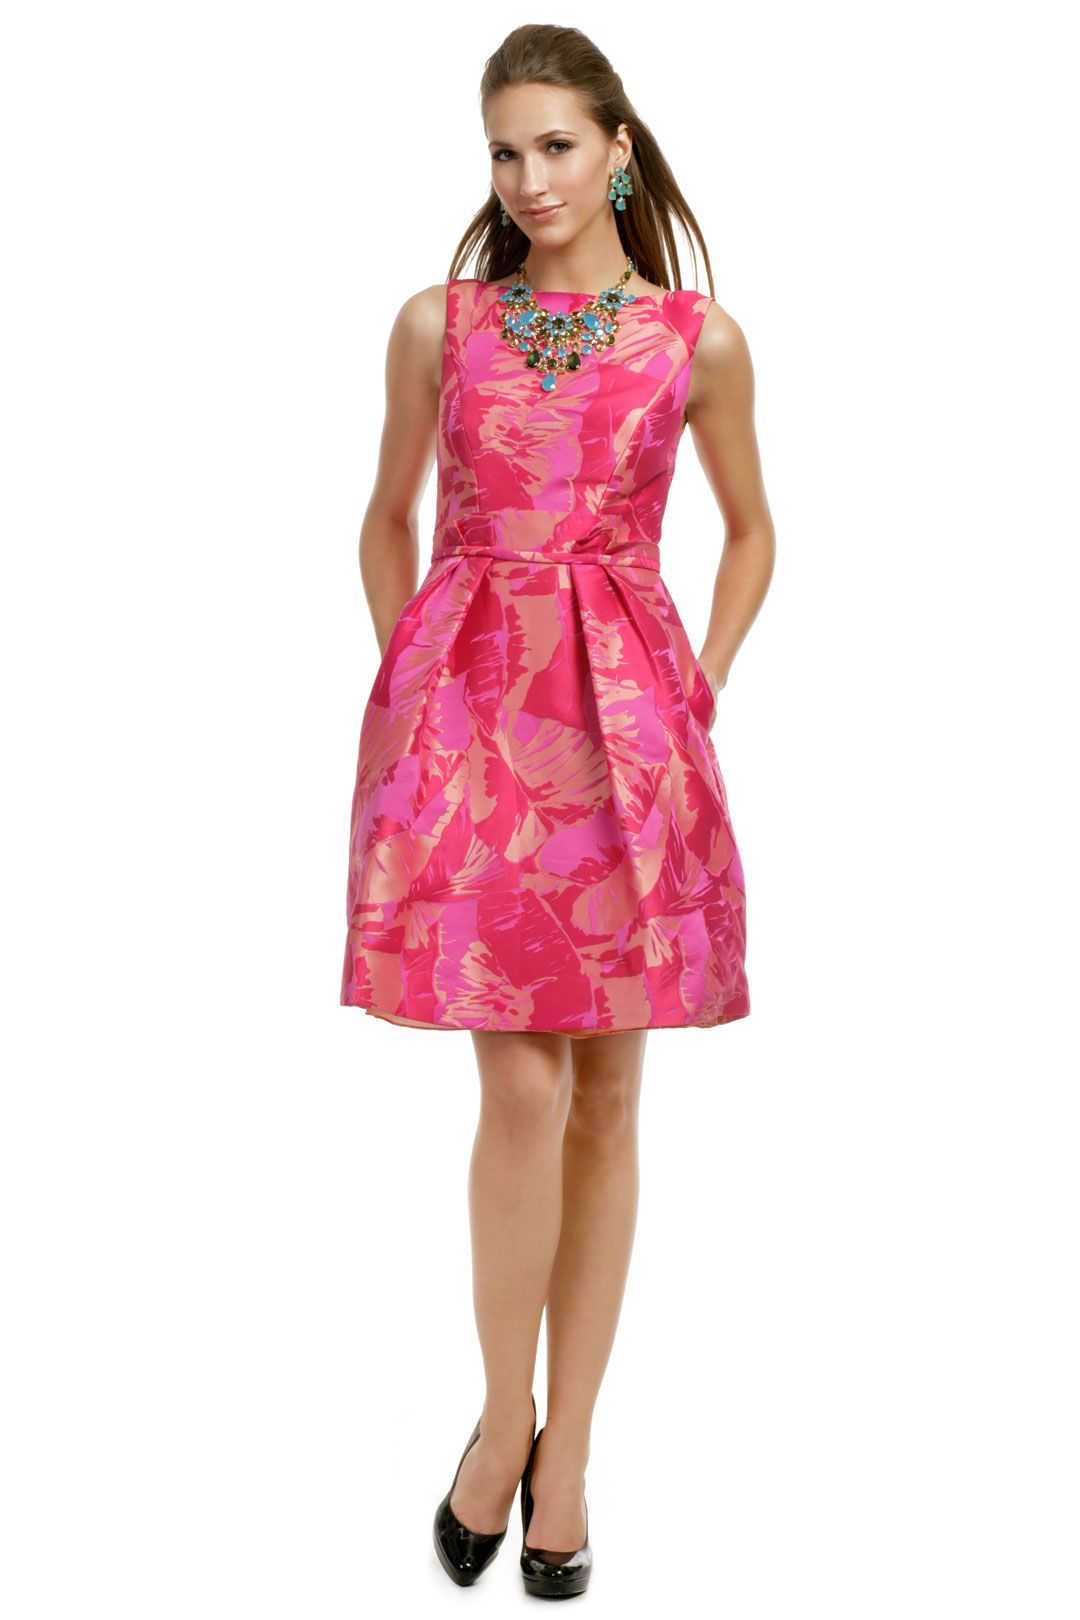 Fuchsia Palm Party Dress | Tropical Weddings | Pinterest ...